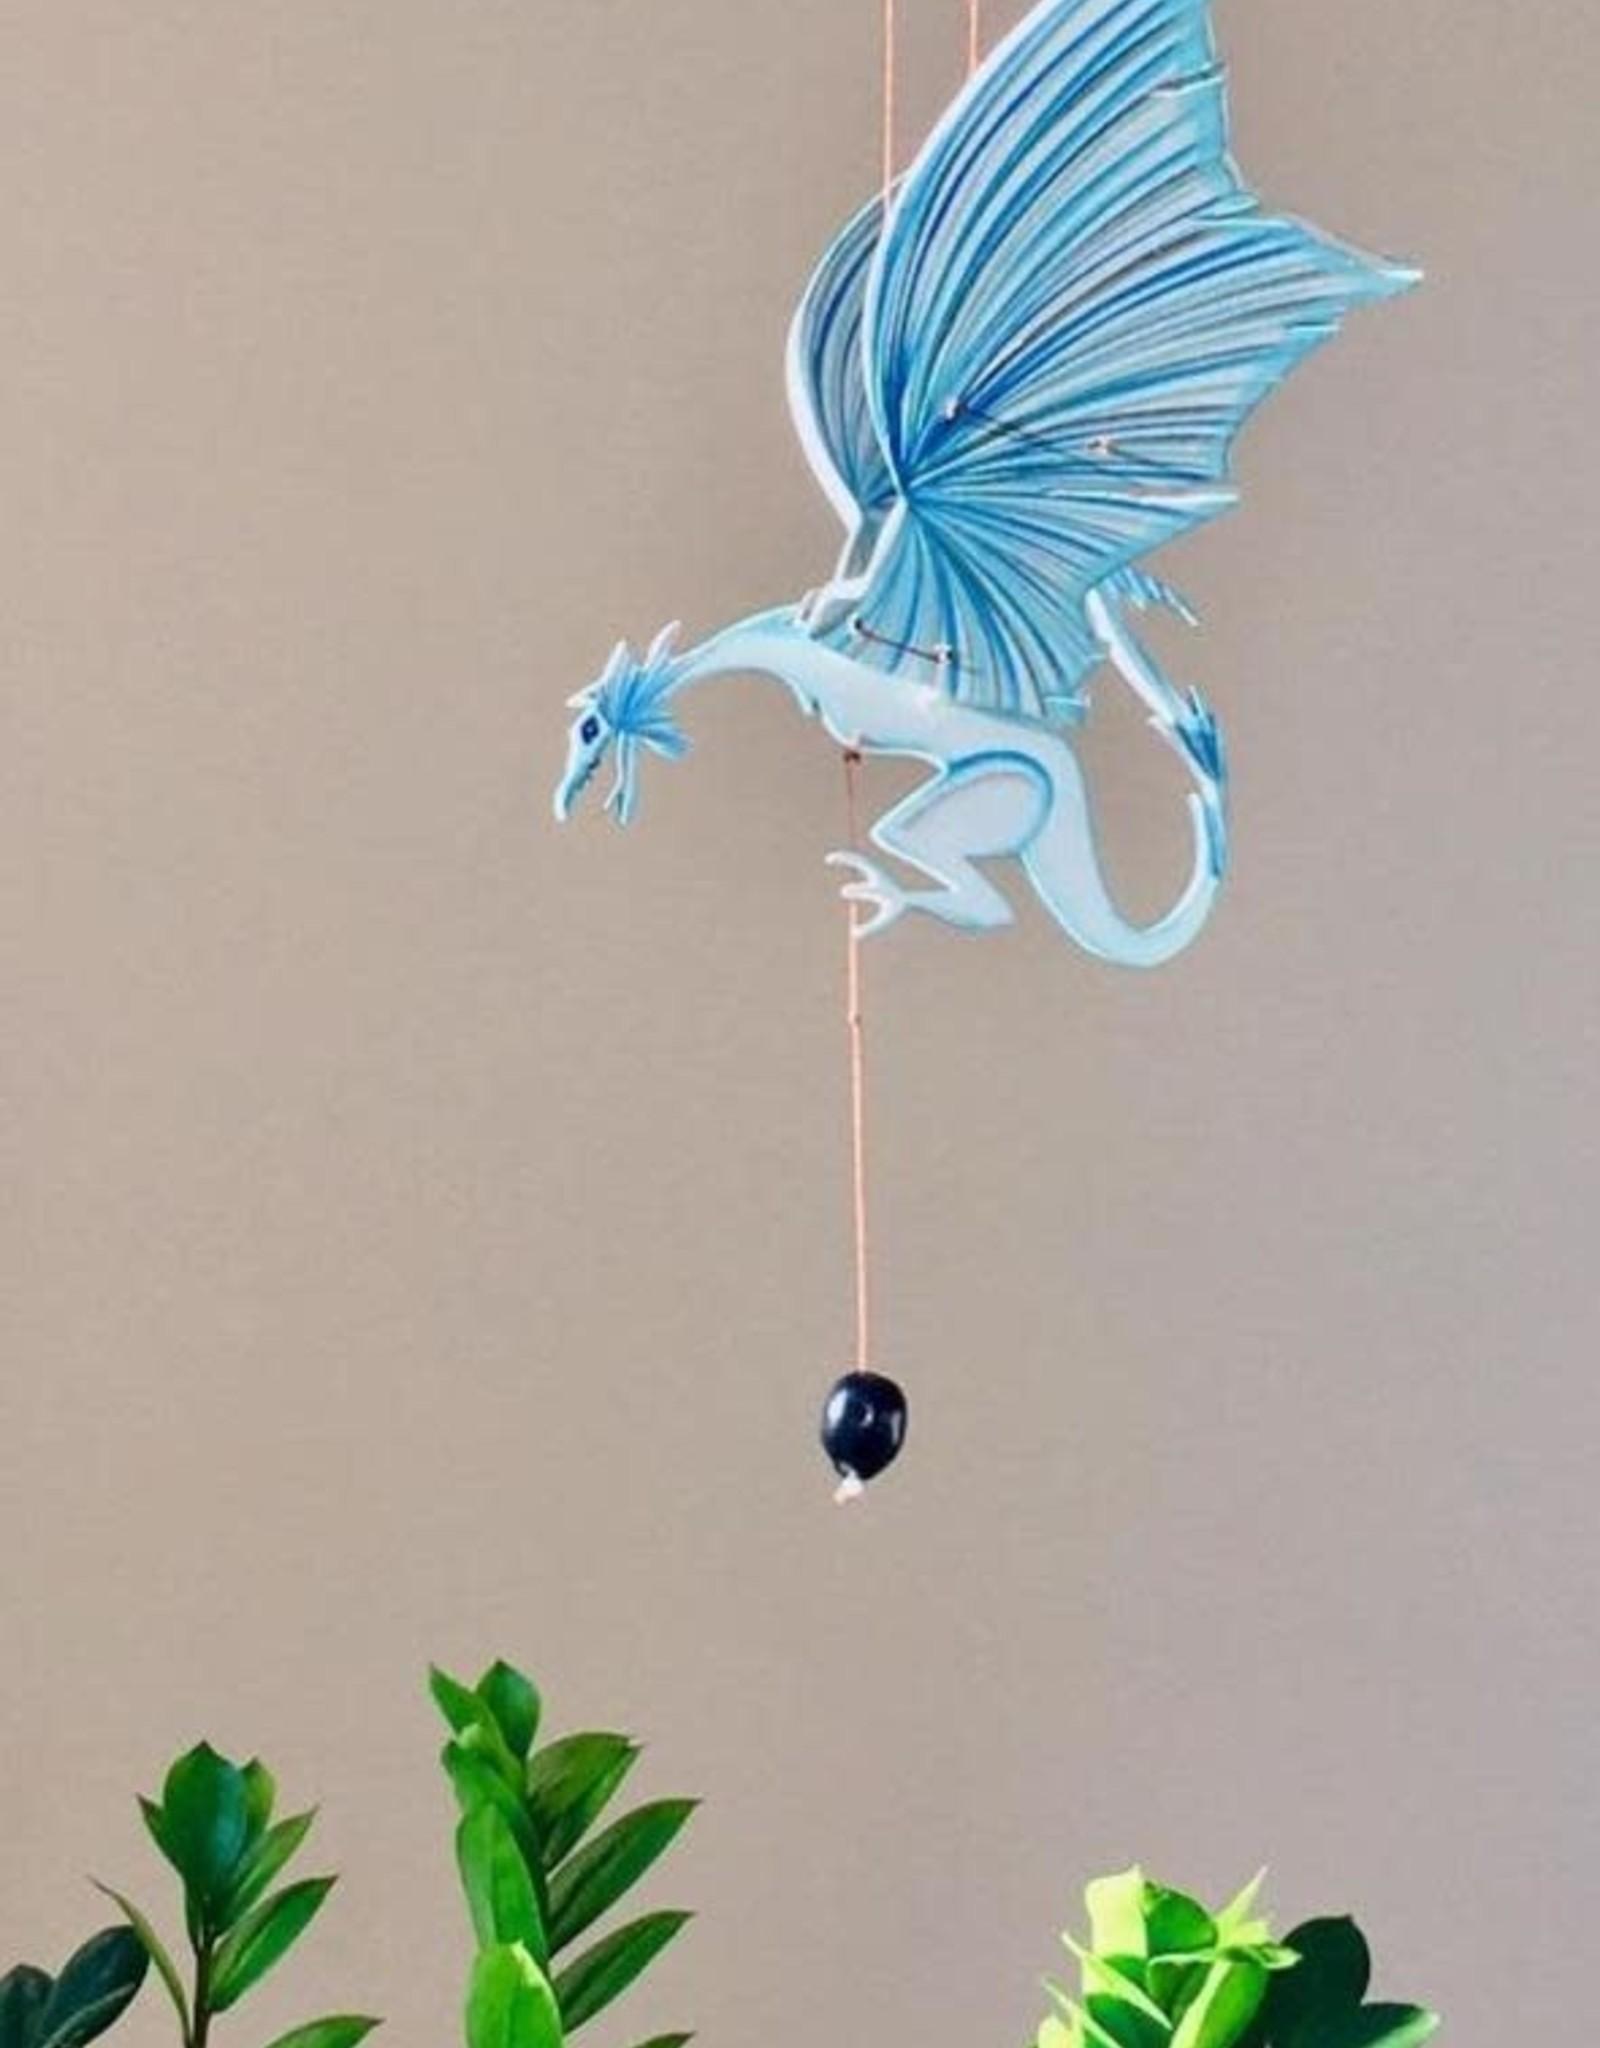 Tulia Artisans Ice Dragon Flying Mobile